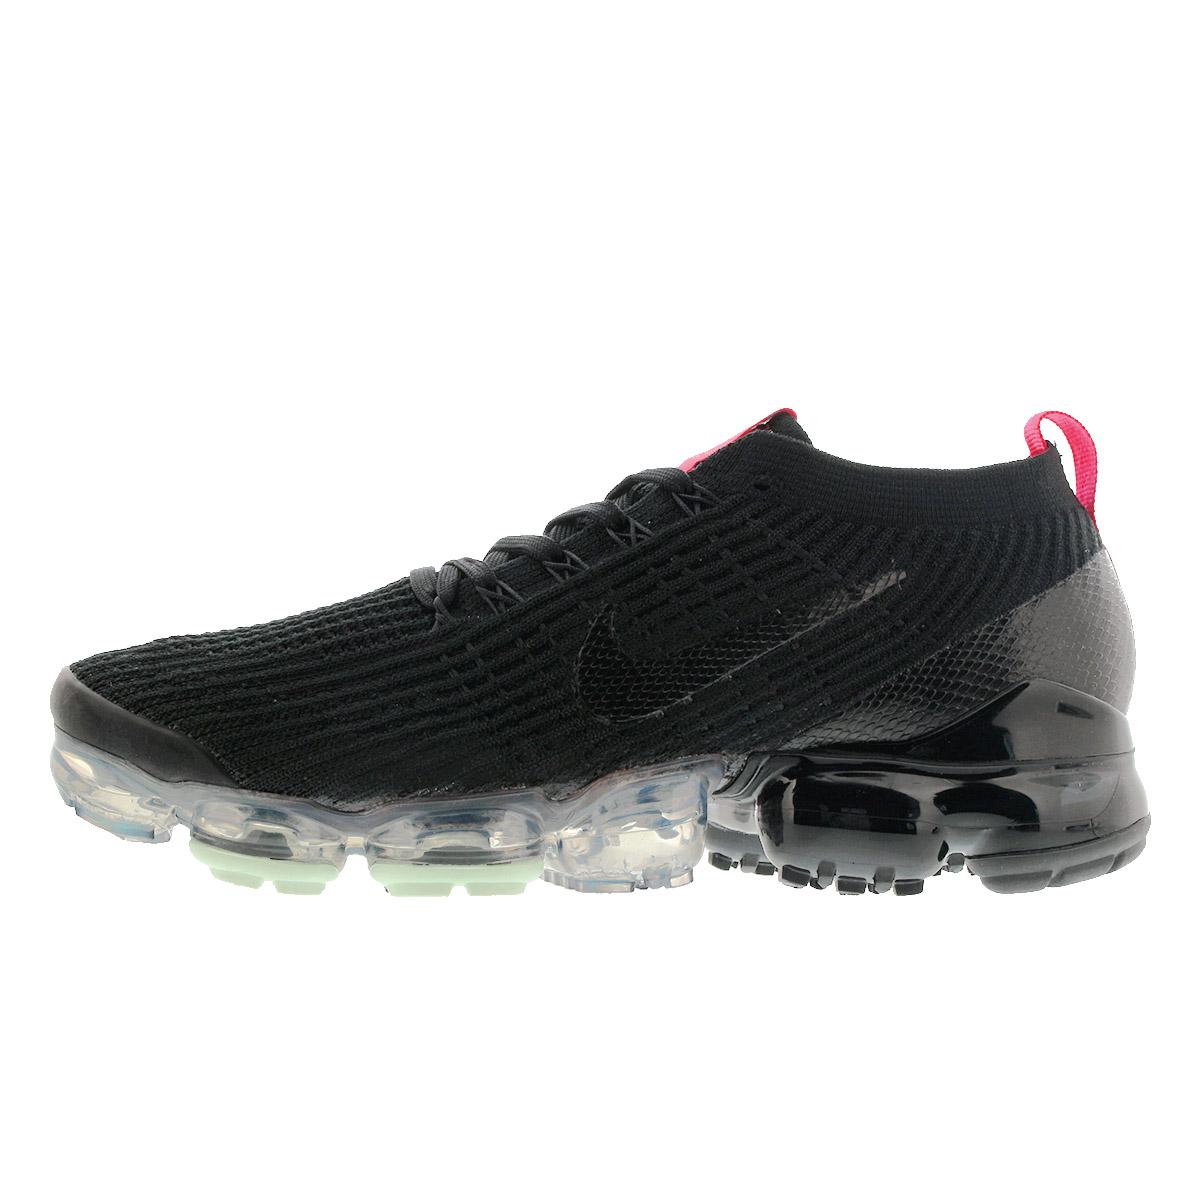 Nike Air Vapormax Flyknit 3 BlackIgloo